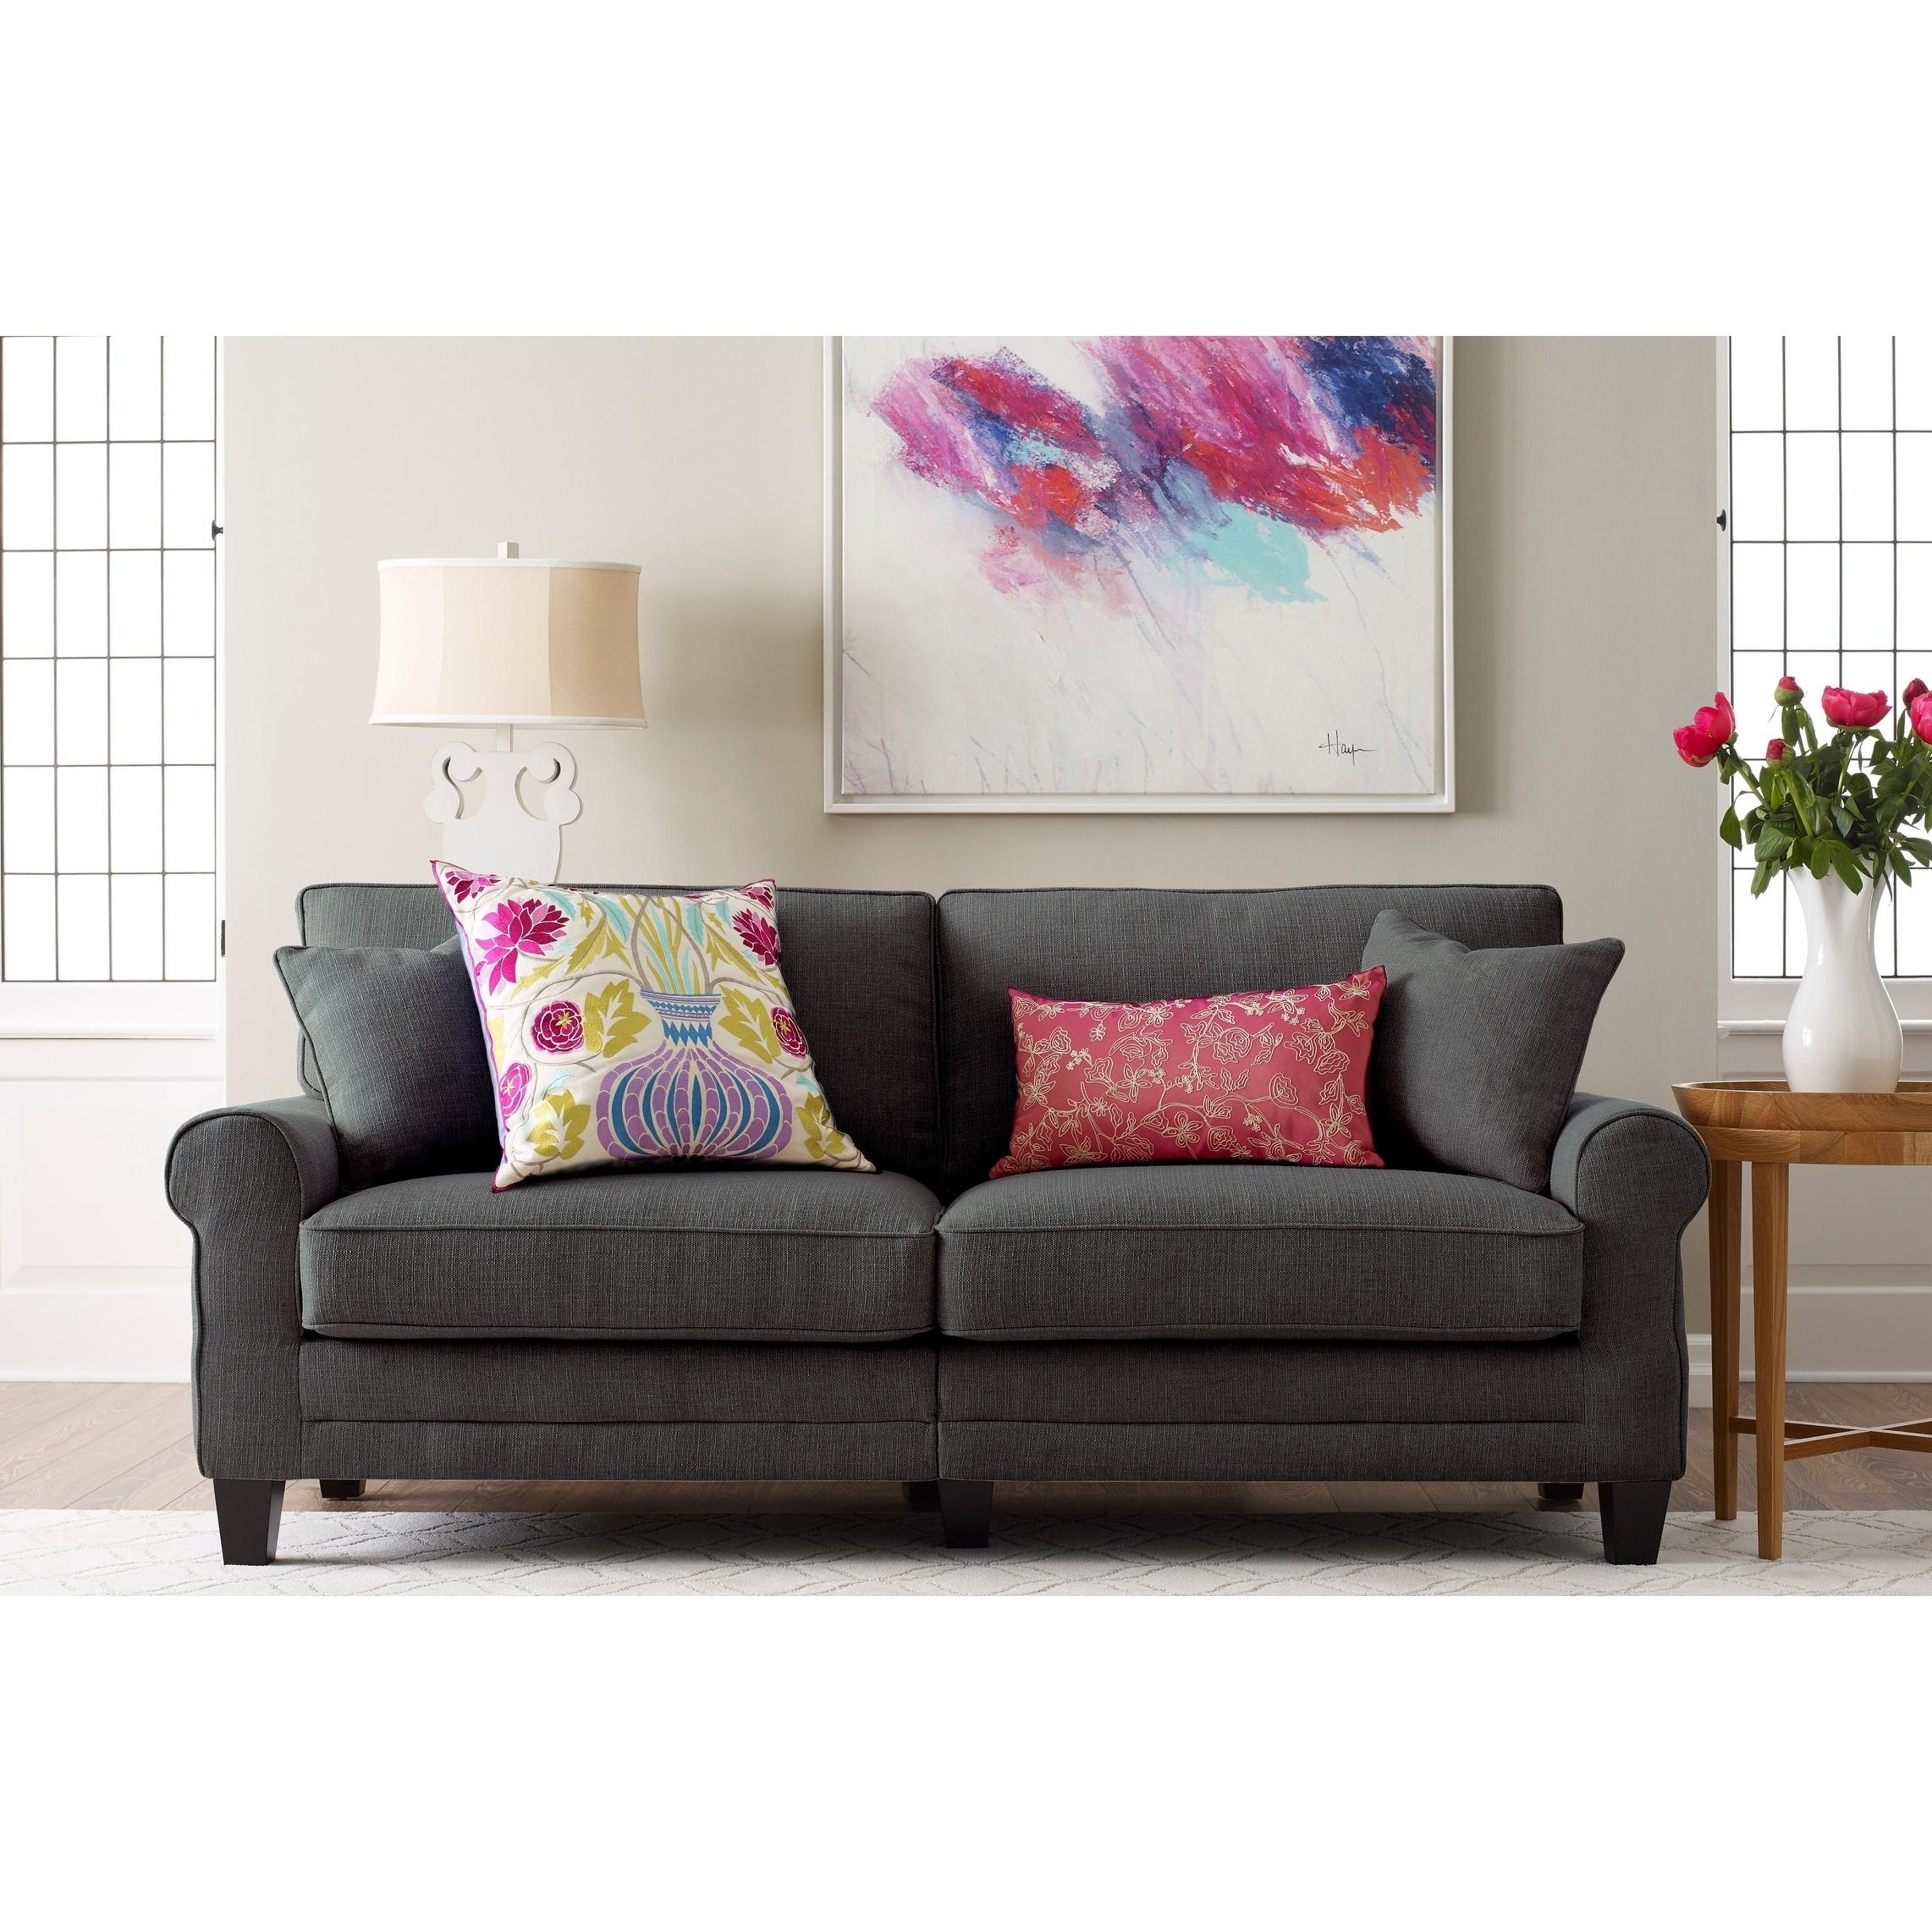 Shop Truly Home Whitney Grey Fabric Upholstered Hardwood